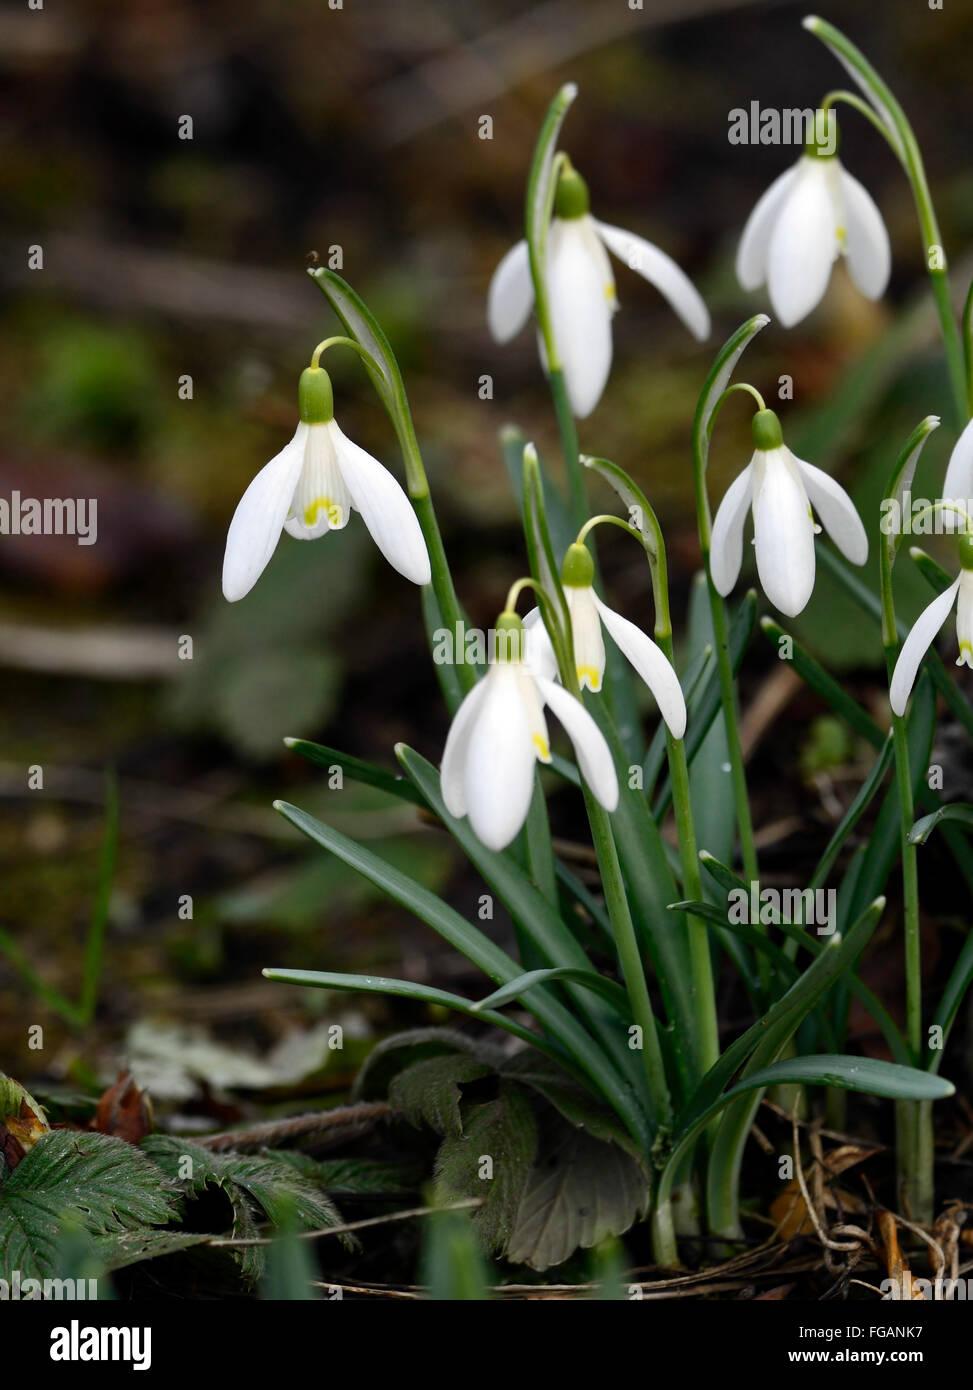 Galanthus Nivalis Blonde Inge white flower flowers yellow markings snowdrops snowdrop spring flowering bulbs RM - Stock Image